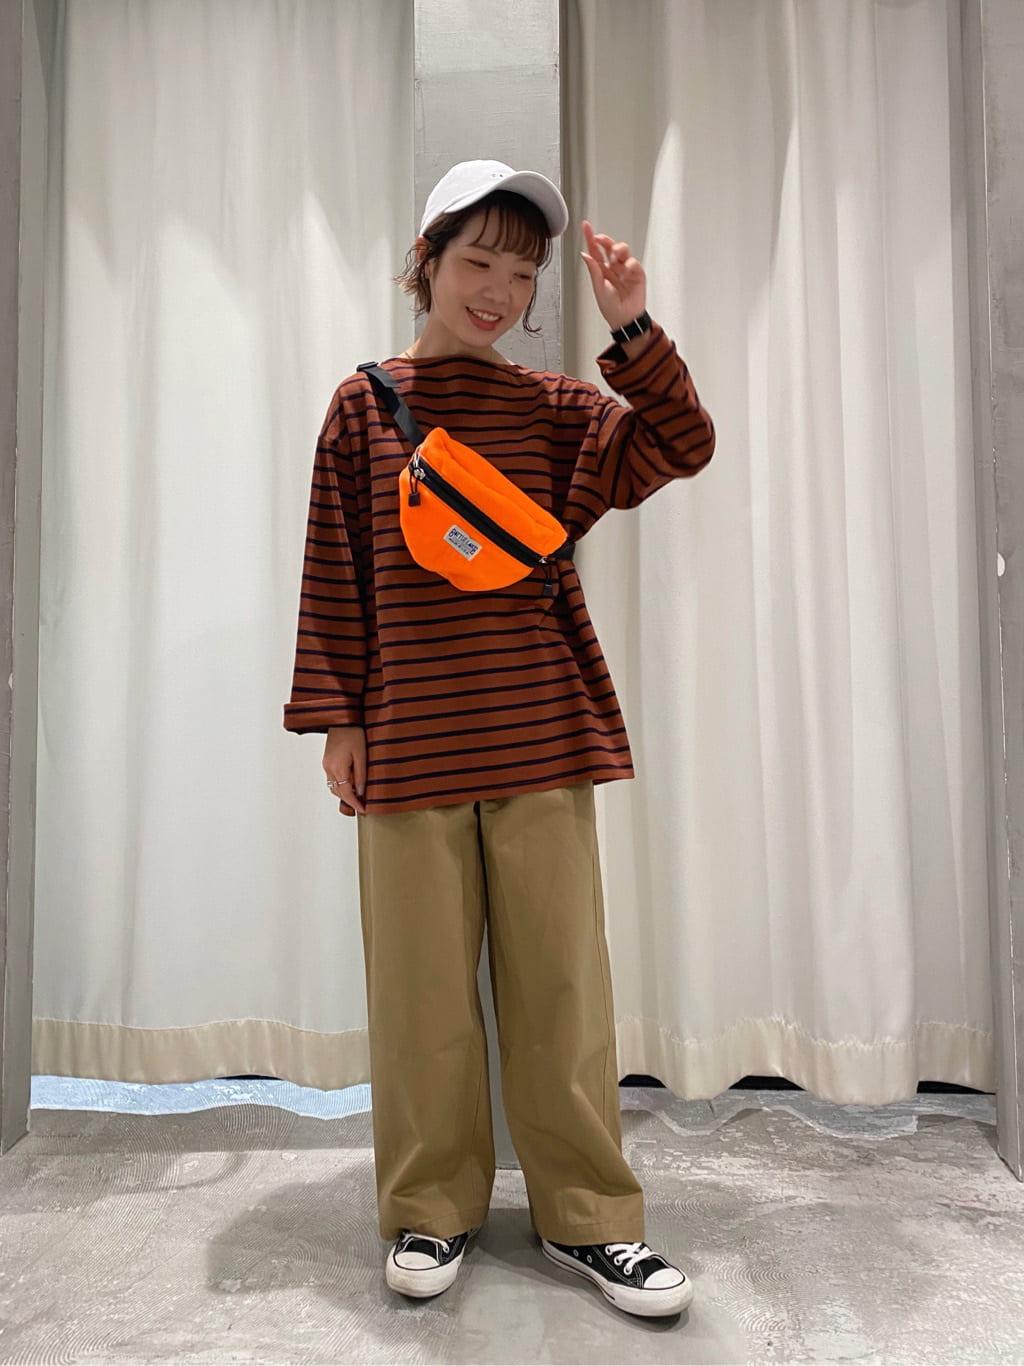 - CHILD WOMAN CHILD WOMAN , PAR ICI ルミネ横浜 身長:153cm 2021.08.14